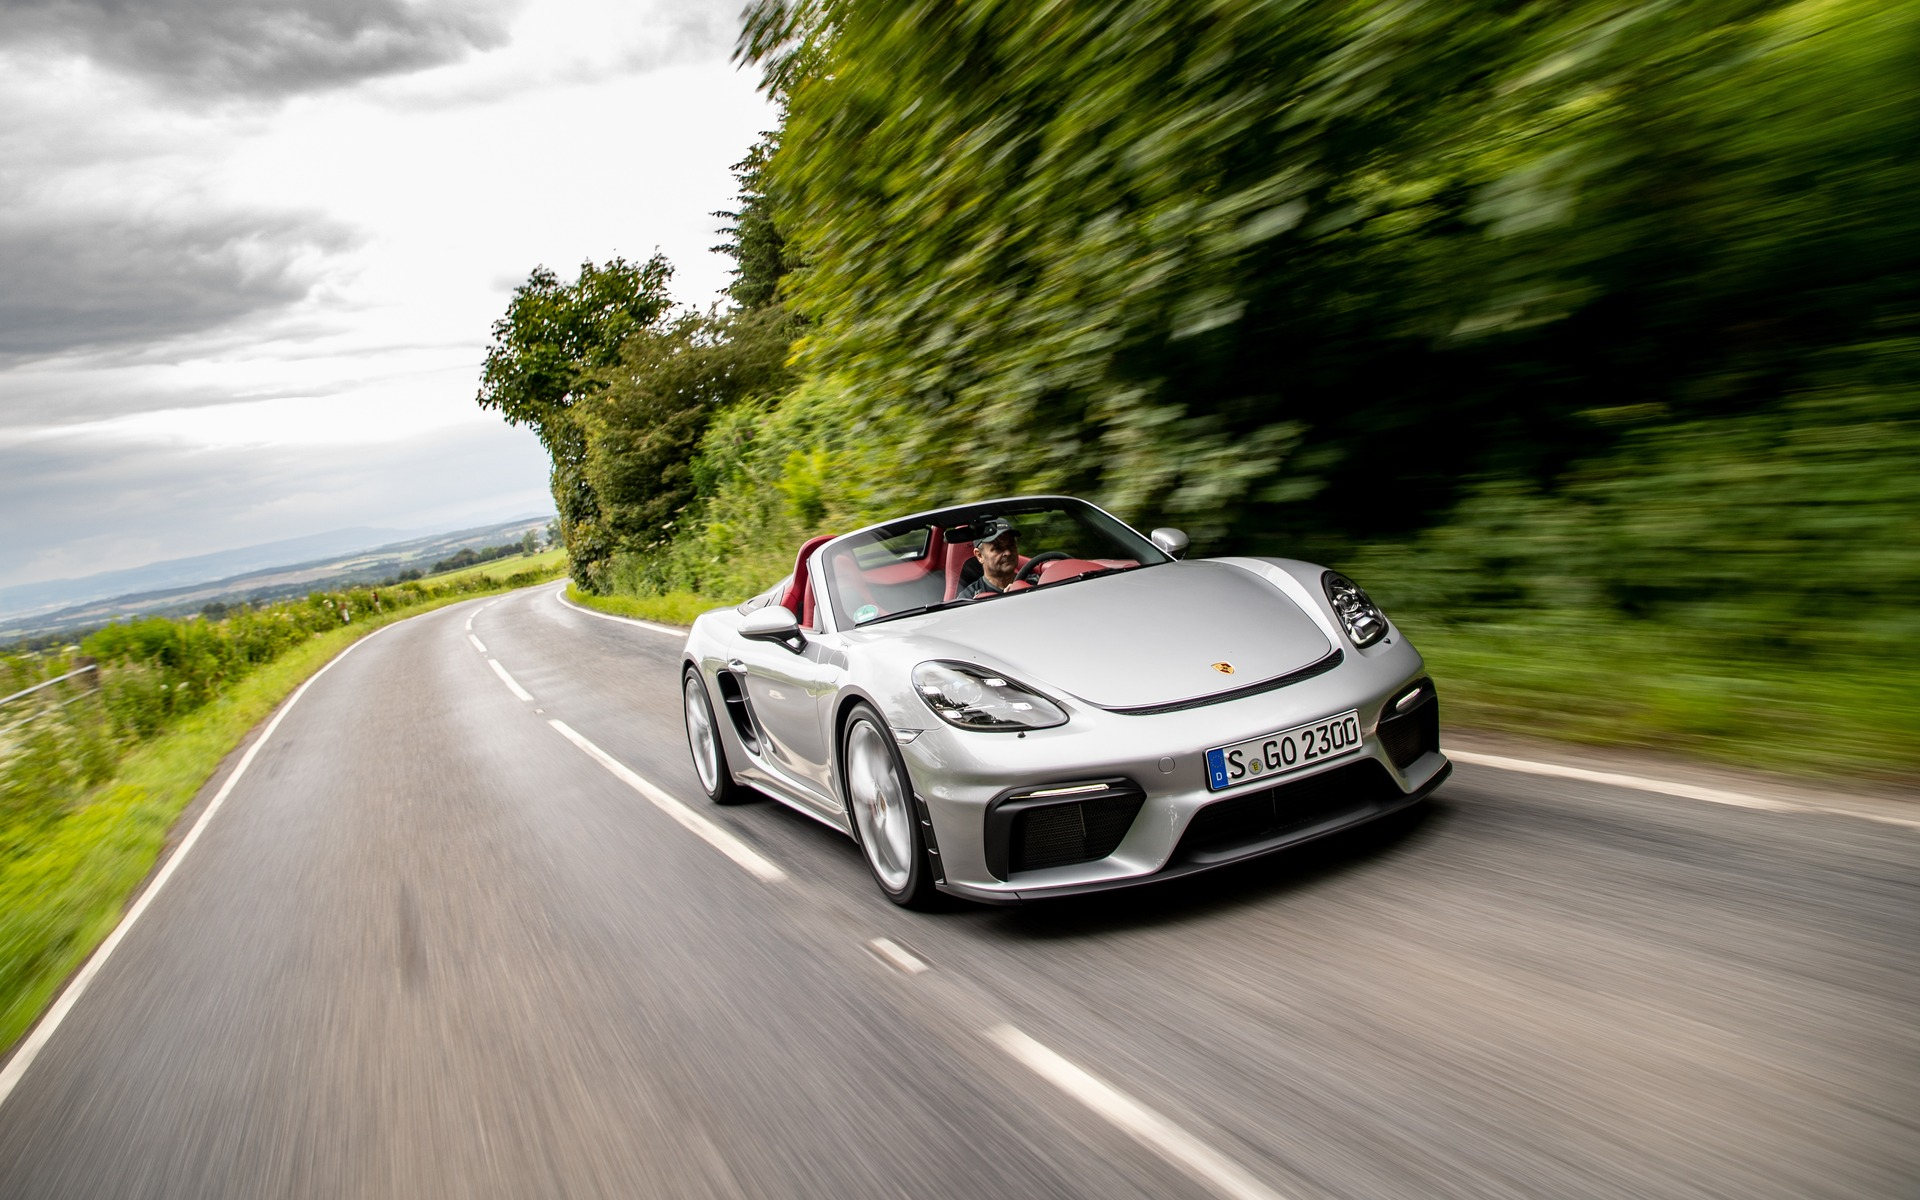 2020 Porsche 718 Spyder and Cayman GT4 The Star Players